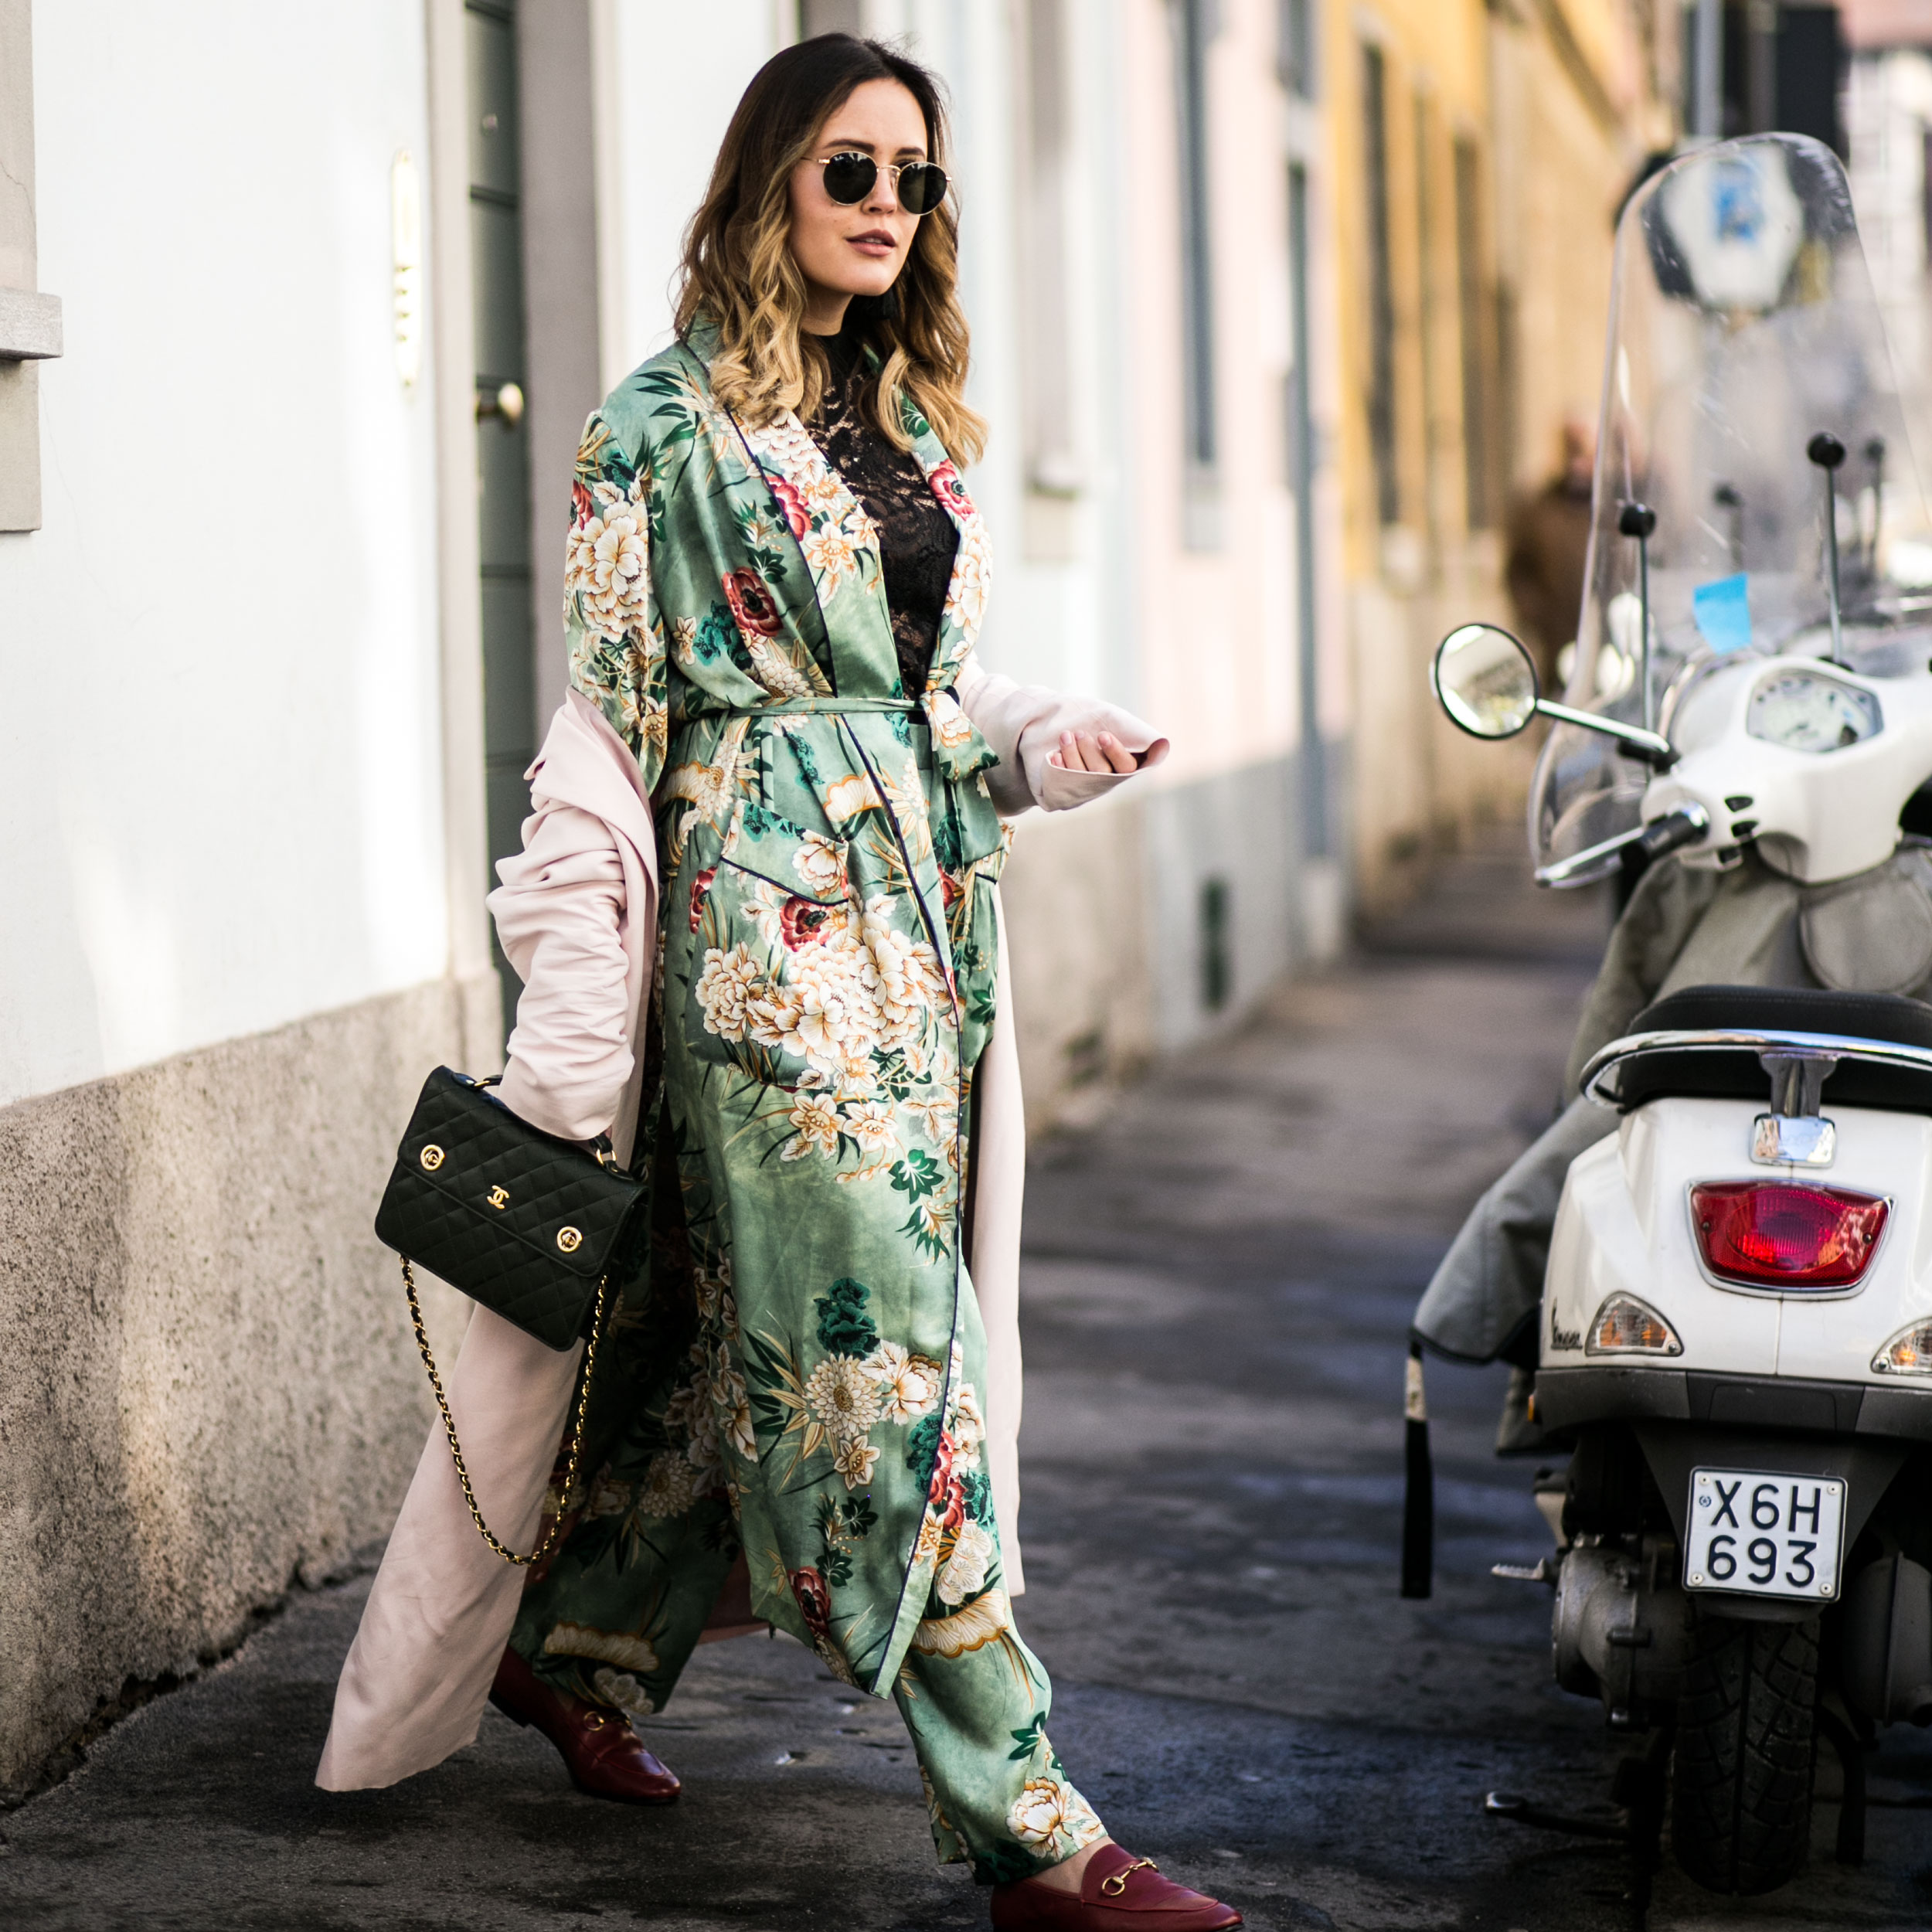 Kimono, Blumenprint, Ray Ban, Chanel, Street Style